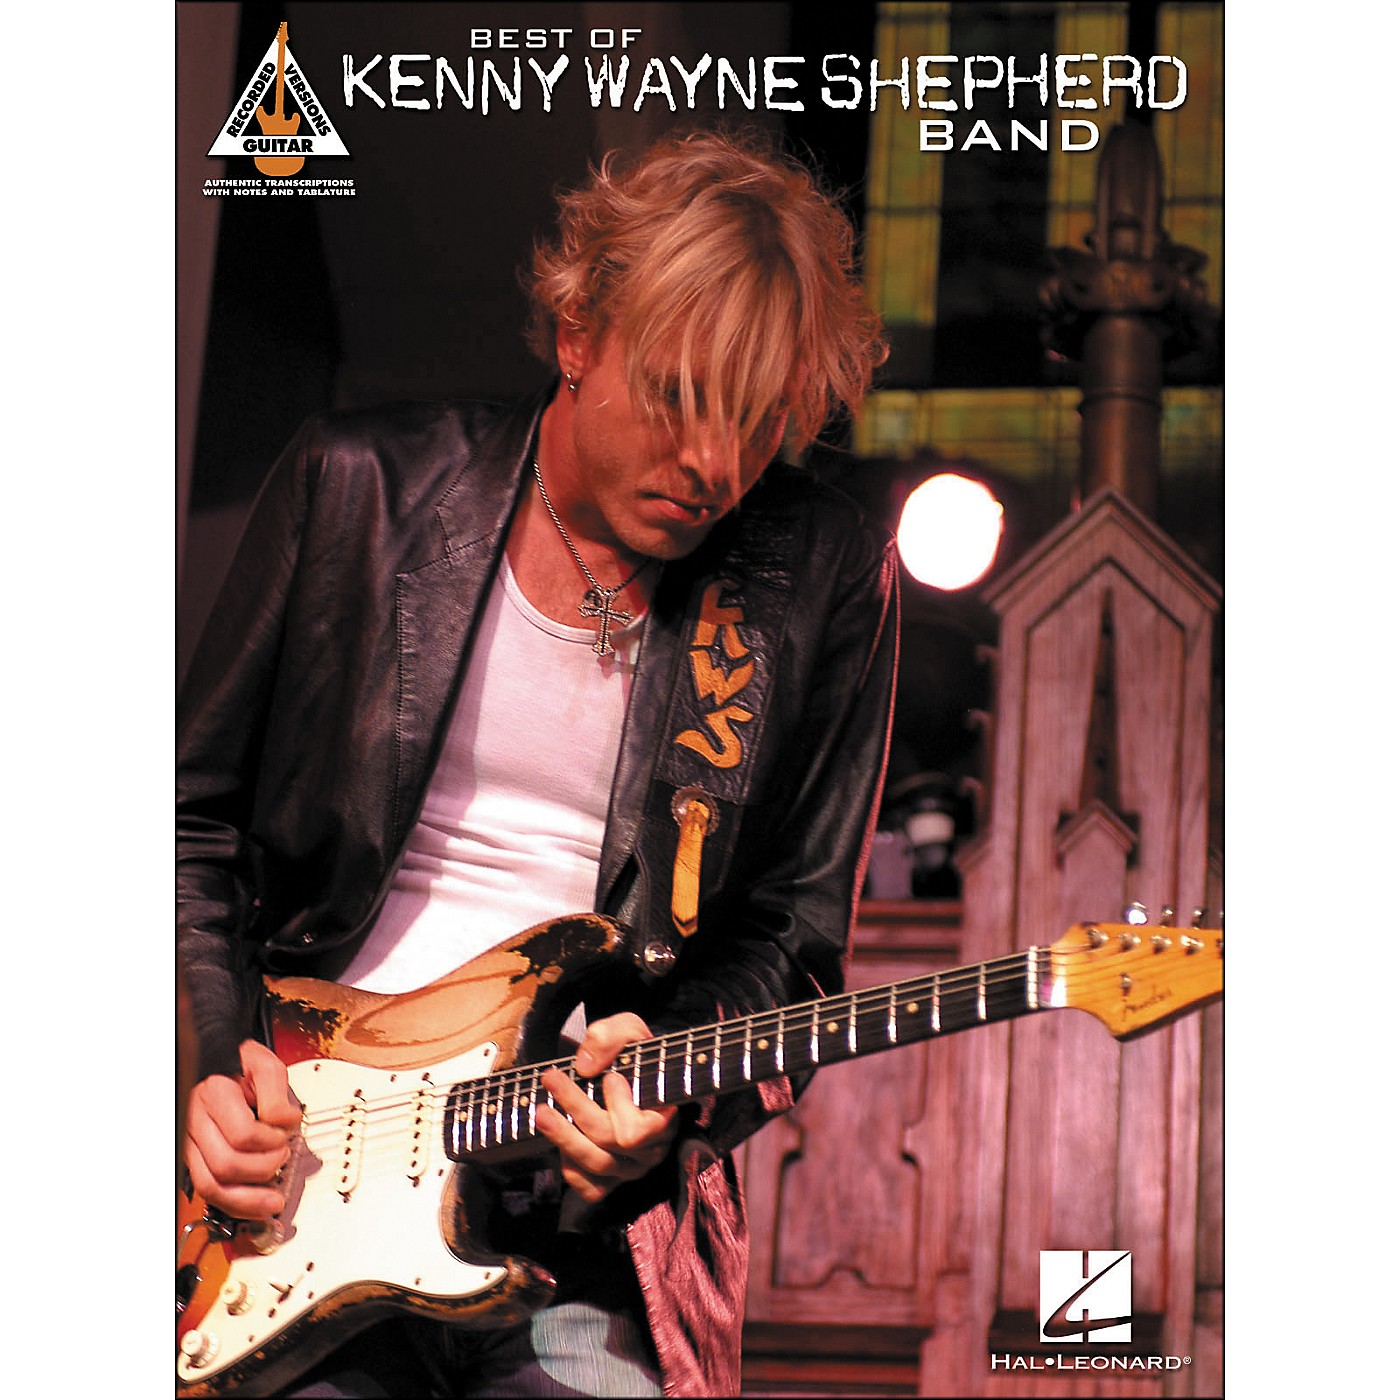 Hal Leonard Best Of Kenny Wayne Shepherd Band Tab Book thumbnail